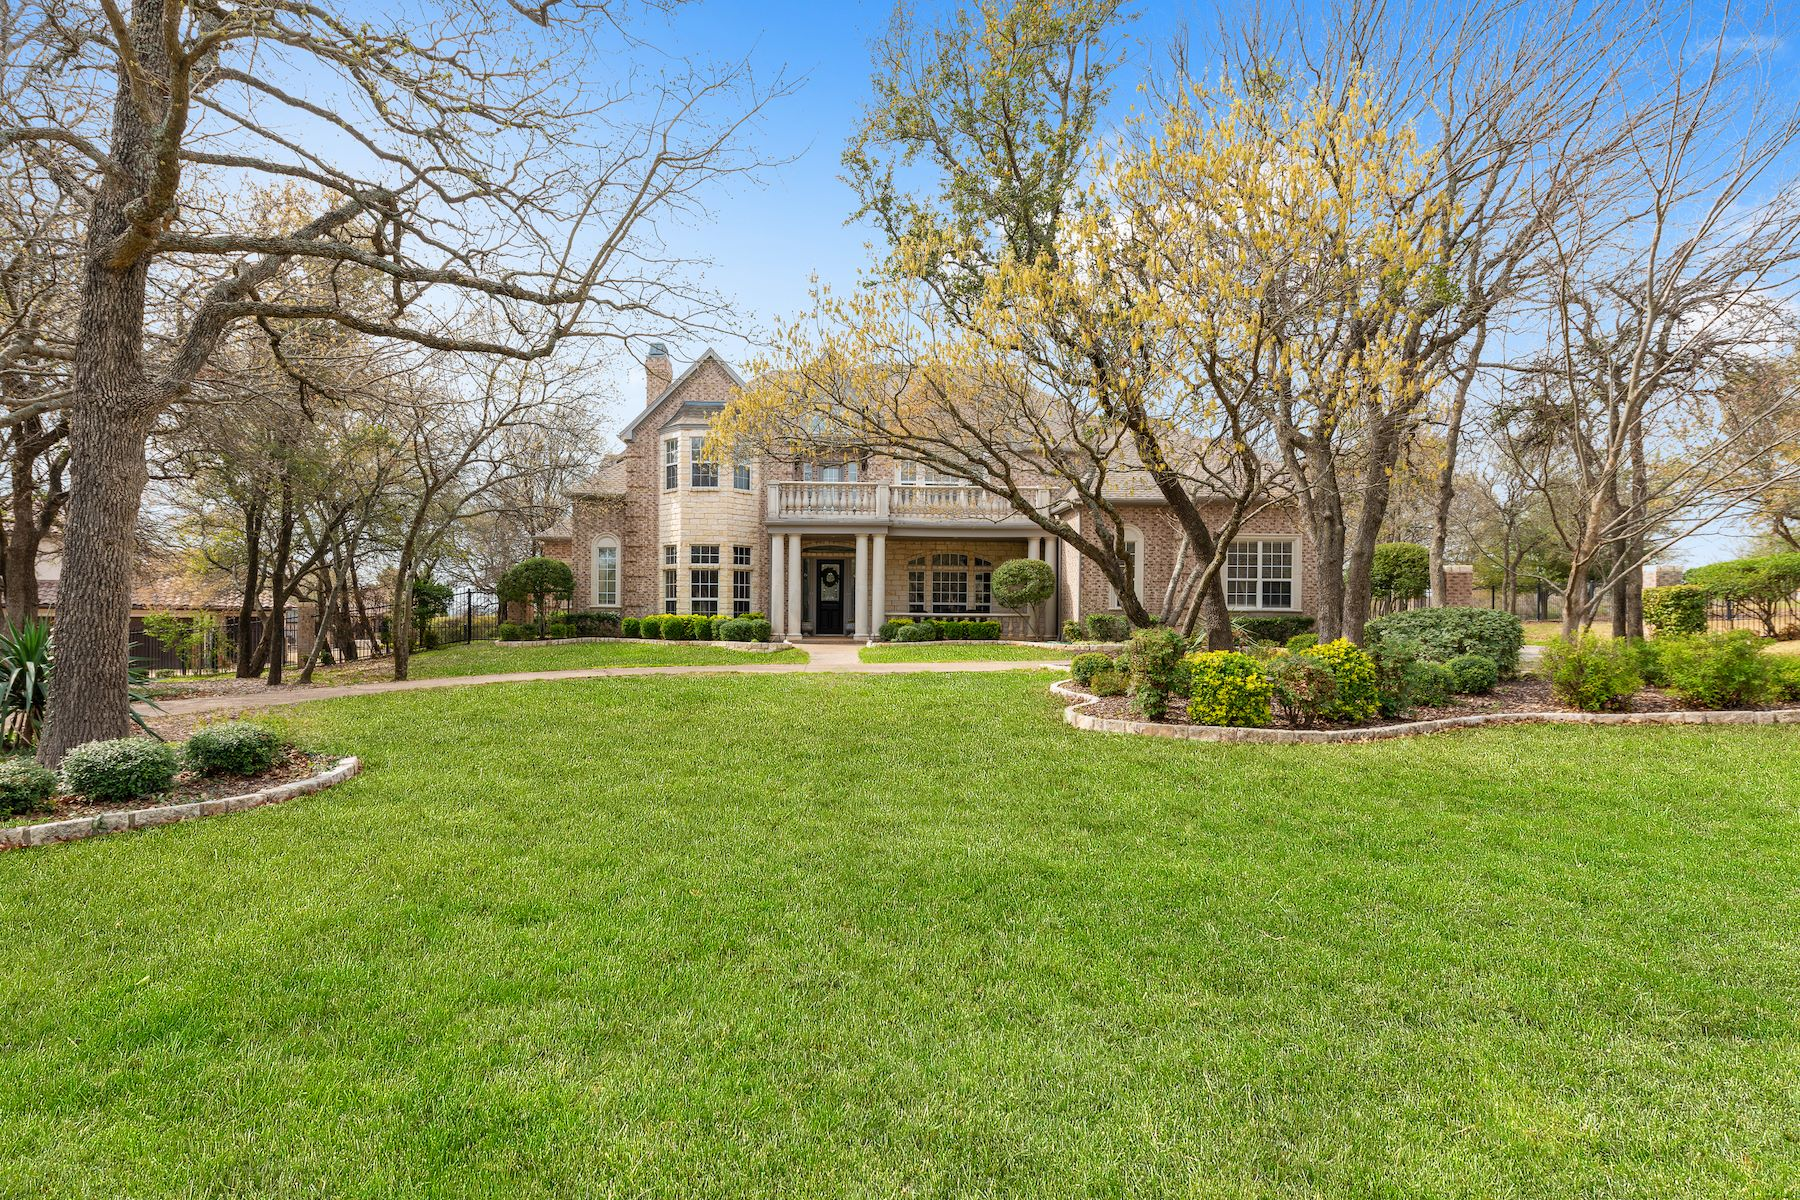 Single Family Homes für Verkauf beim Boasting location, privacy, spaciousness, and graceful updates 1323 Steeple Chase Lane, Aledo, Texas 76008 Vereinigte Staaten